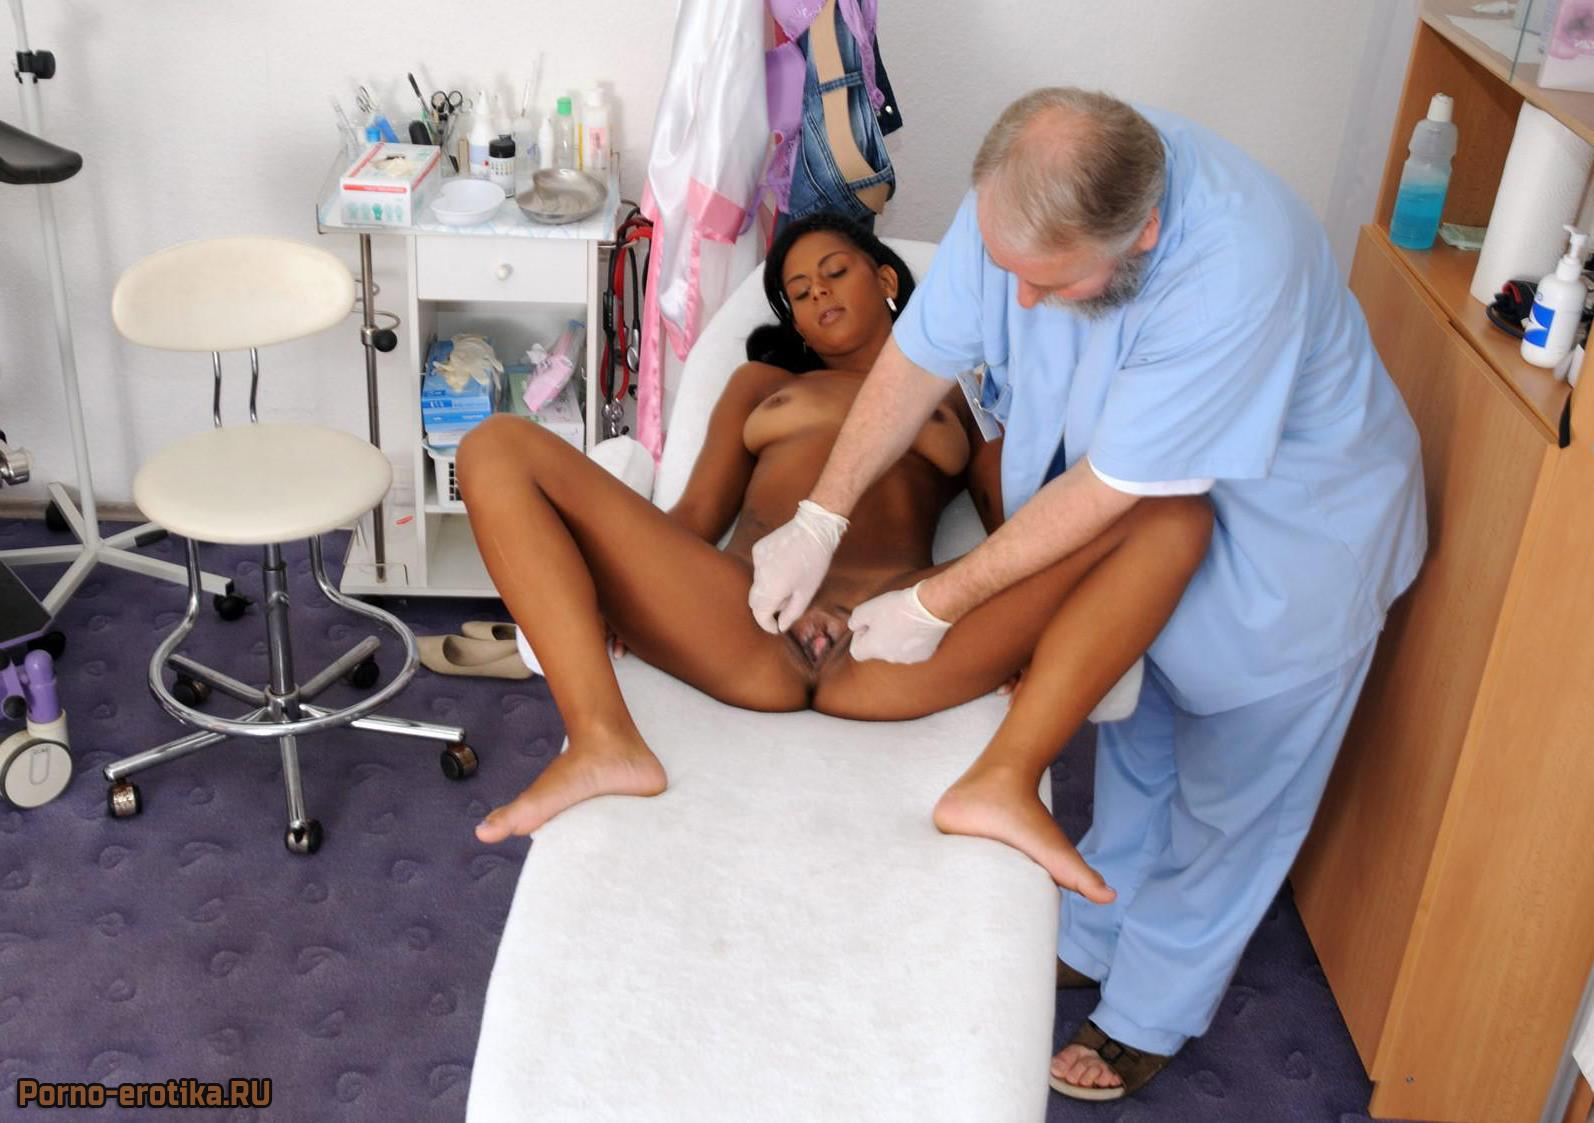 Молодая пациентка на приеме у гинеколога | Молодая эротика